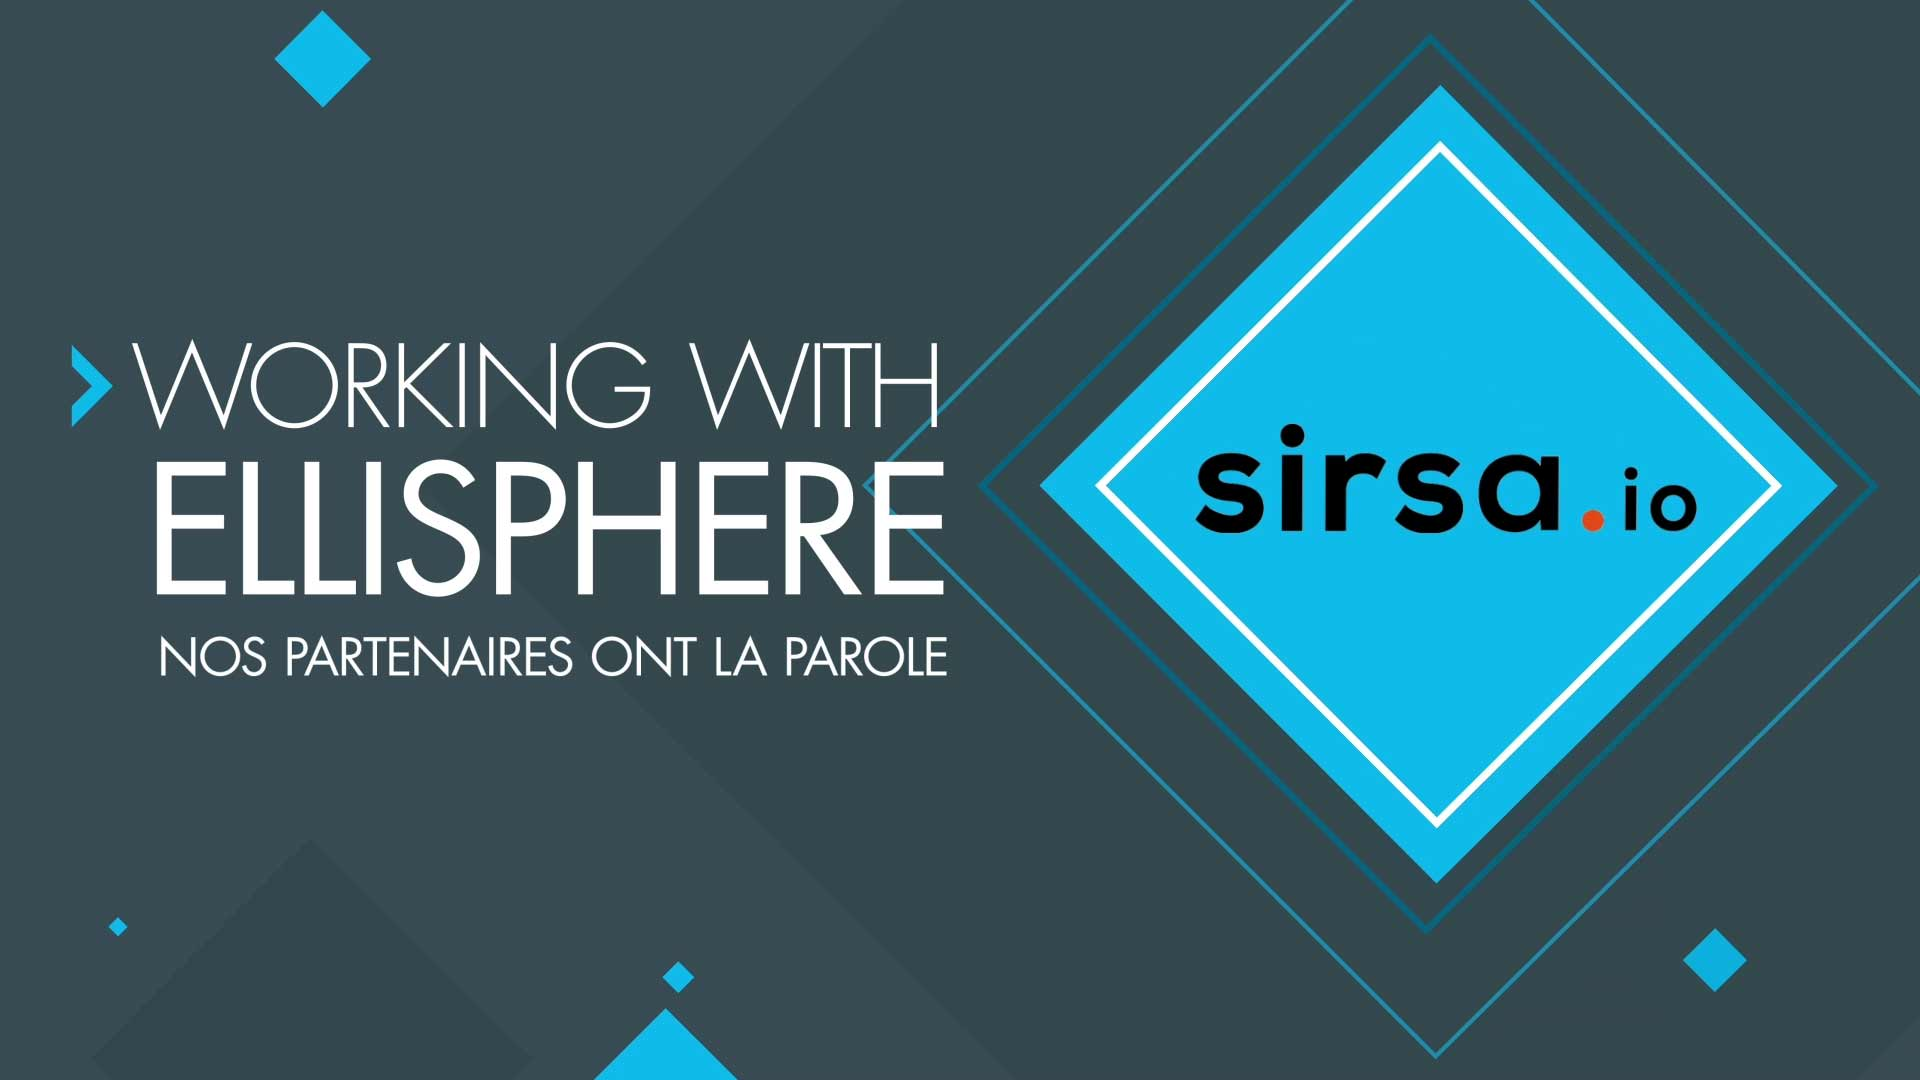 Working with Ellisphere Sirsa